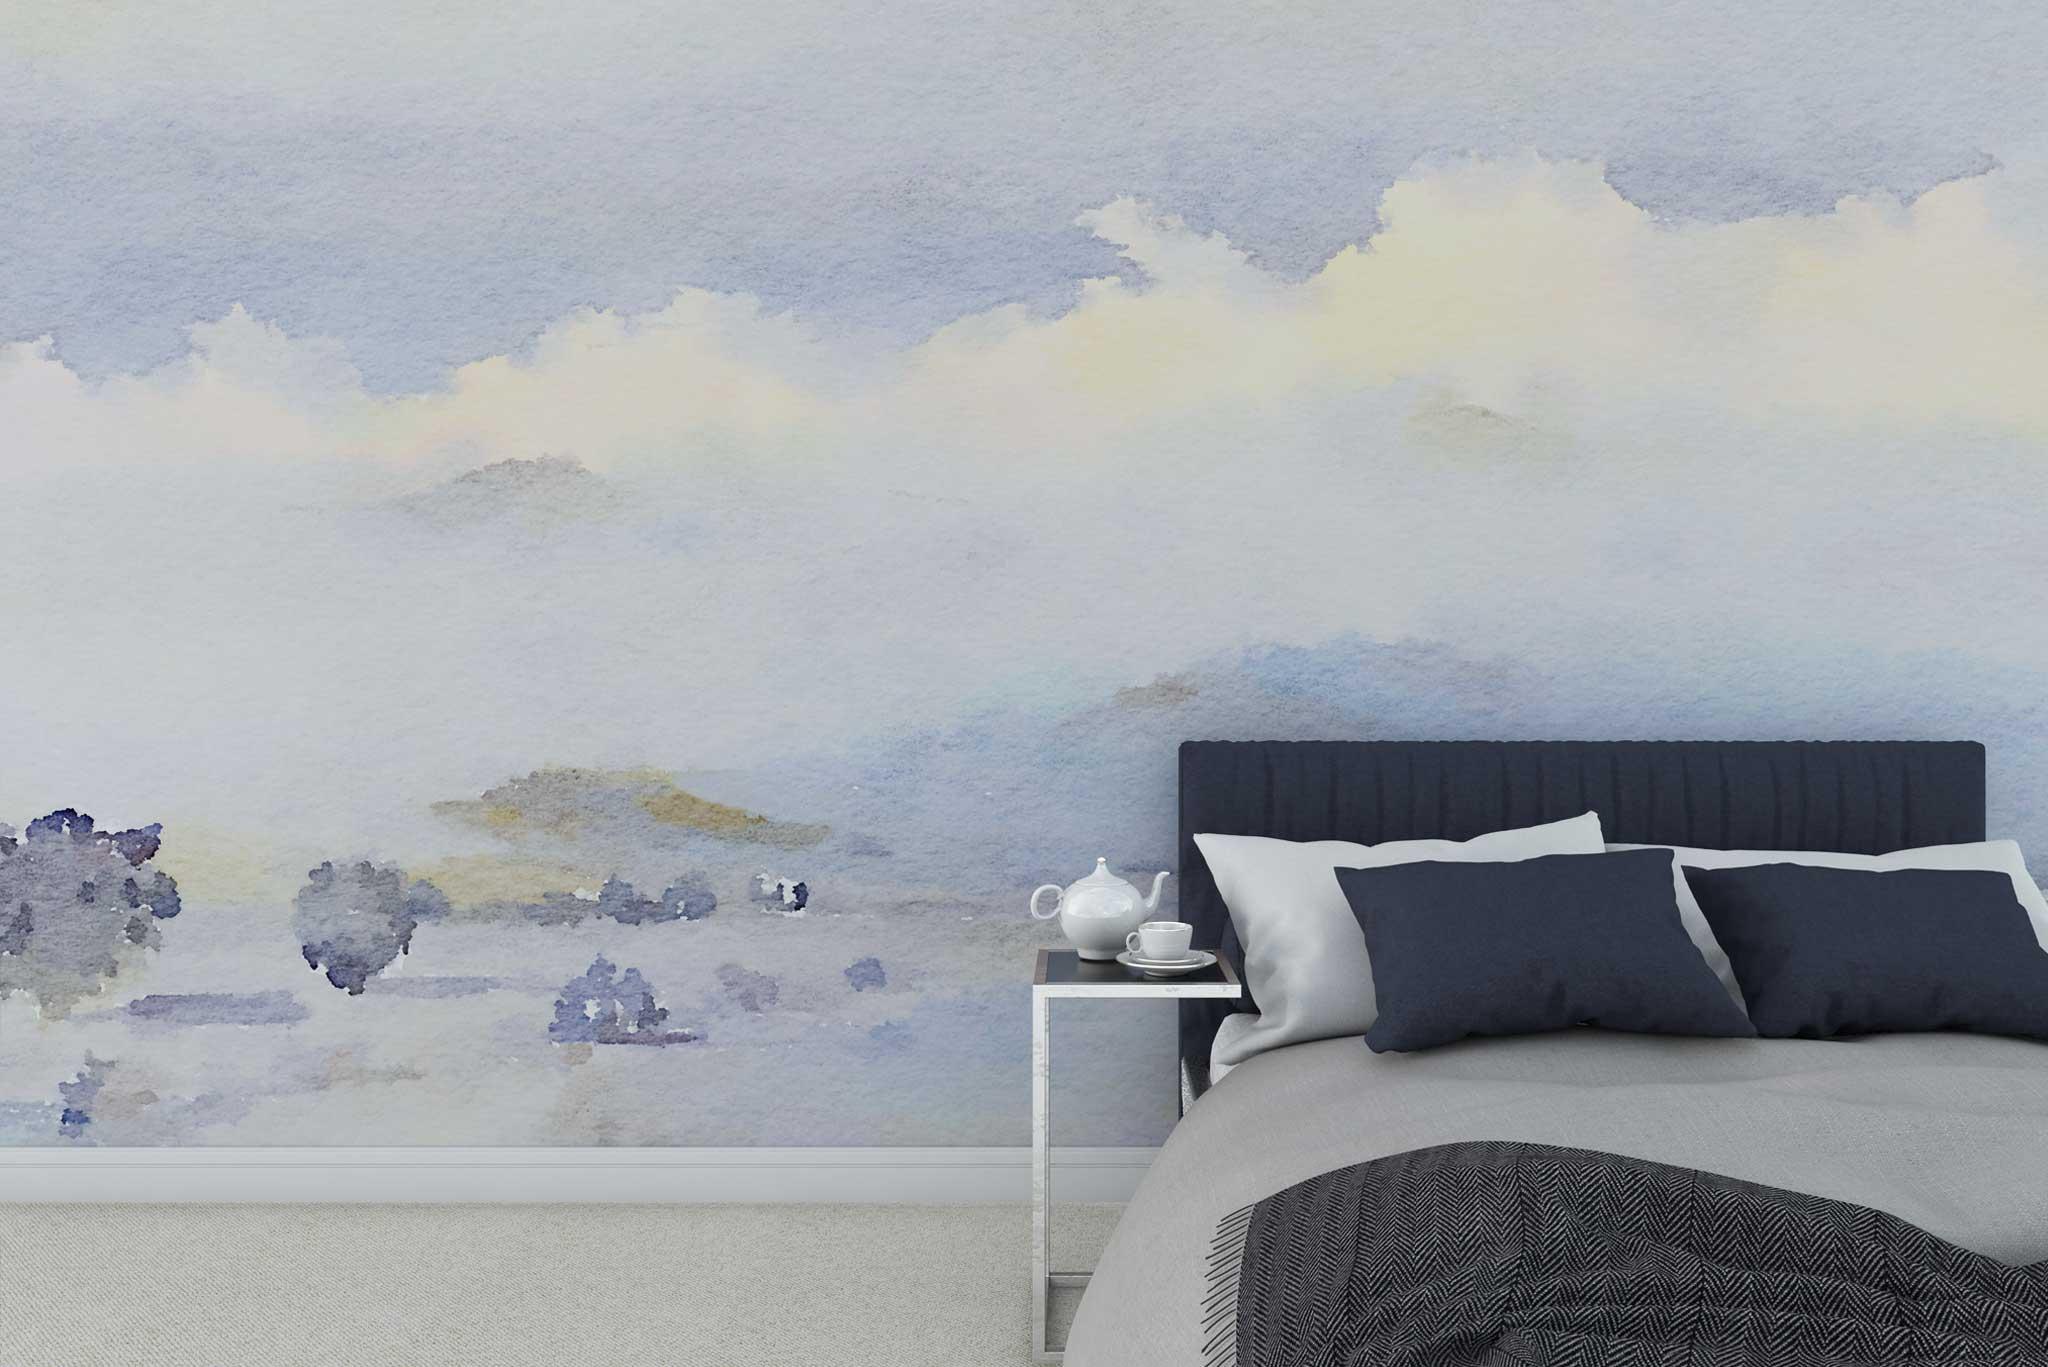 http://daringprints.ro/wp-content/uploads/2020/12/tapet-fototapet-special-personalizat-customizabil-comanda-bucuresti-daring-prints-model-desen-ilustratie-acuarela-peisaj-bleu-pastel.jpg